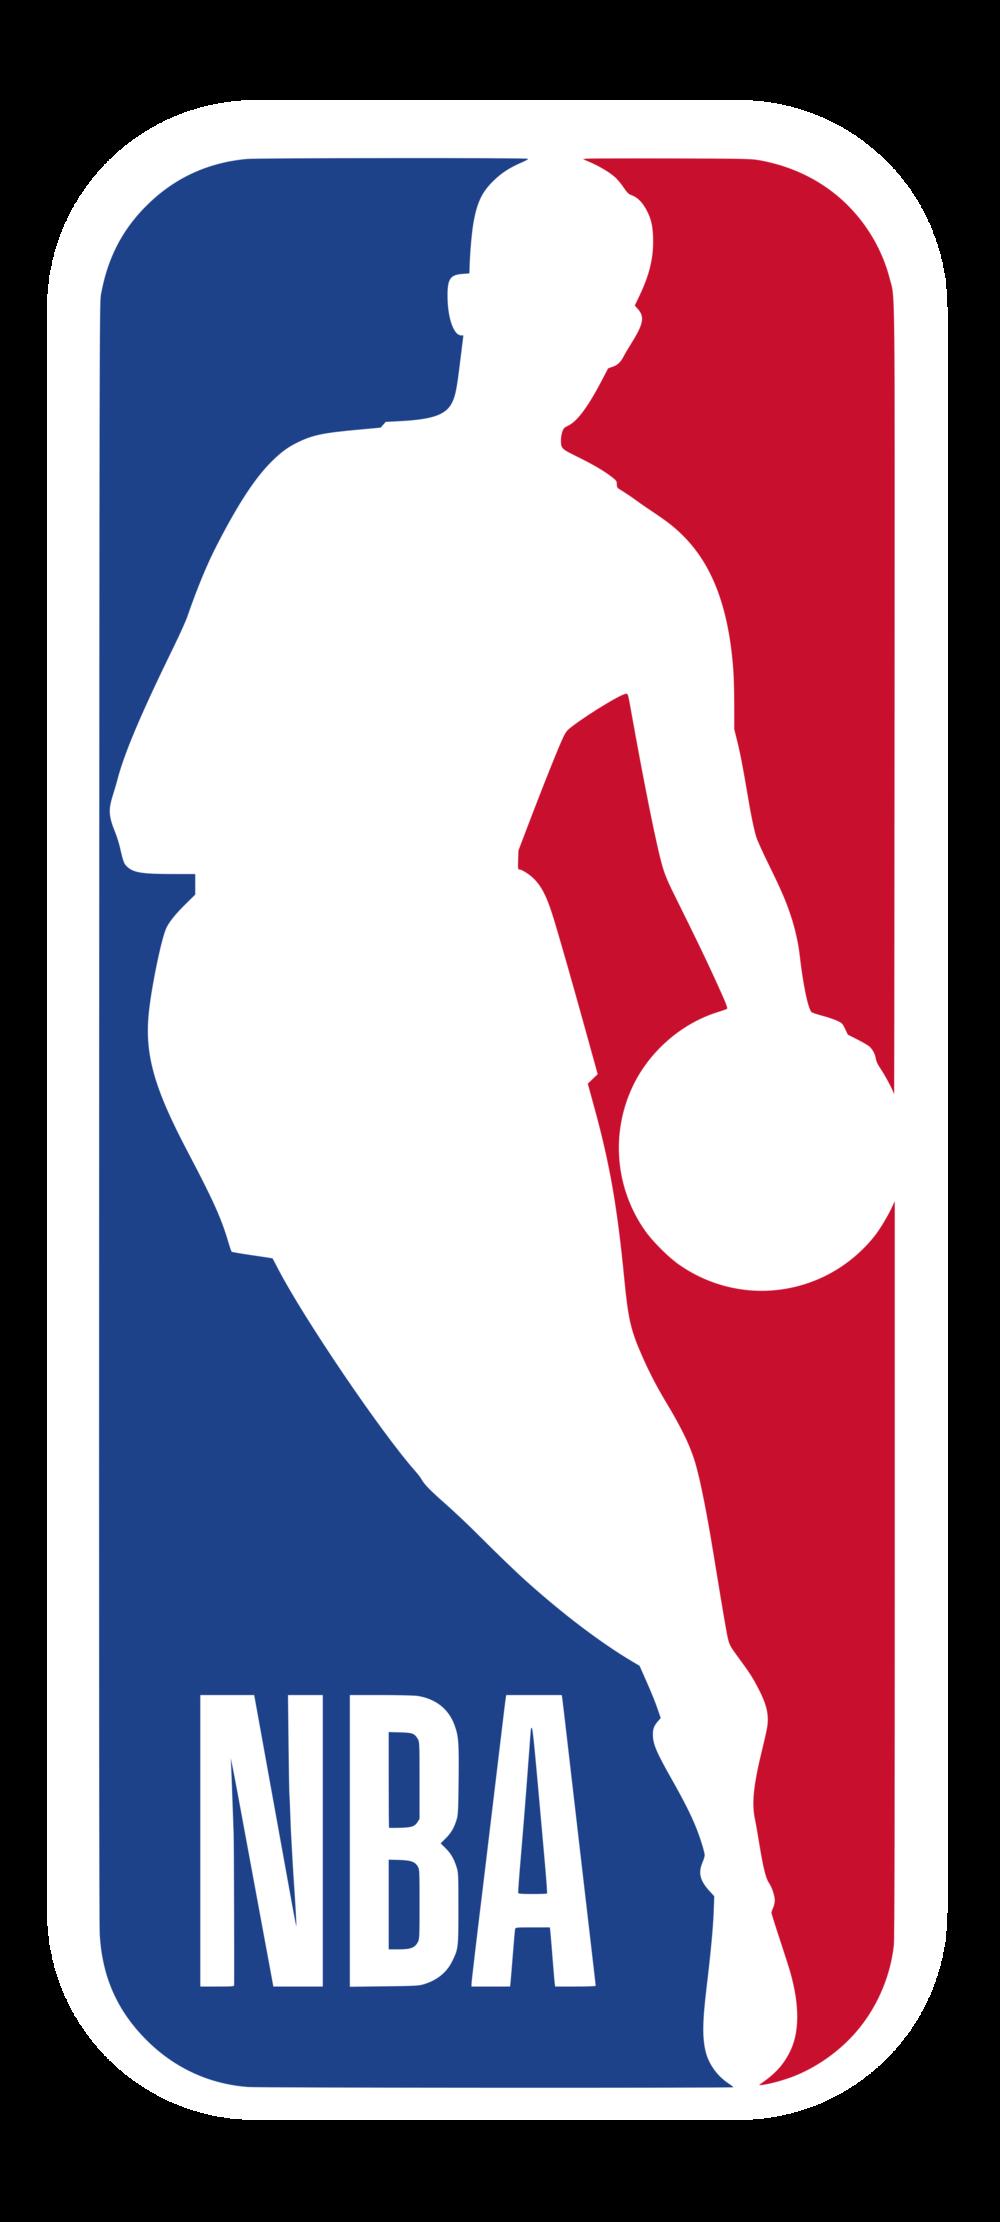 NBA Banned Substances